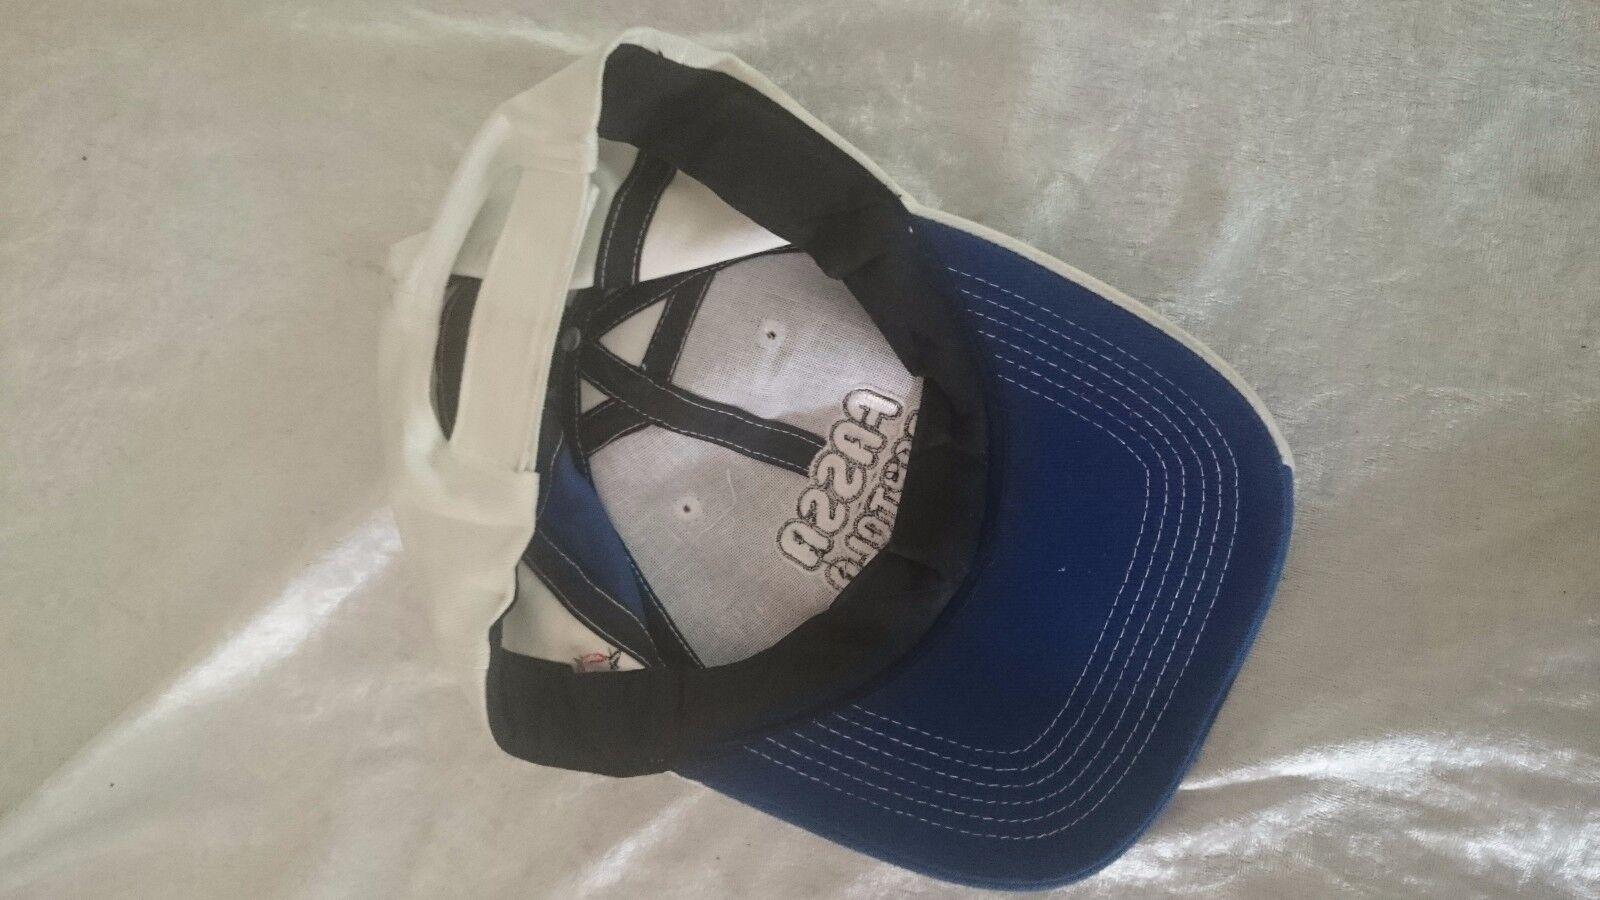 Fassa Bortolo Cap  Hat  Cap ships in 24 hours a90346